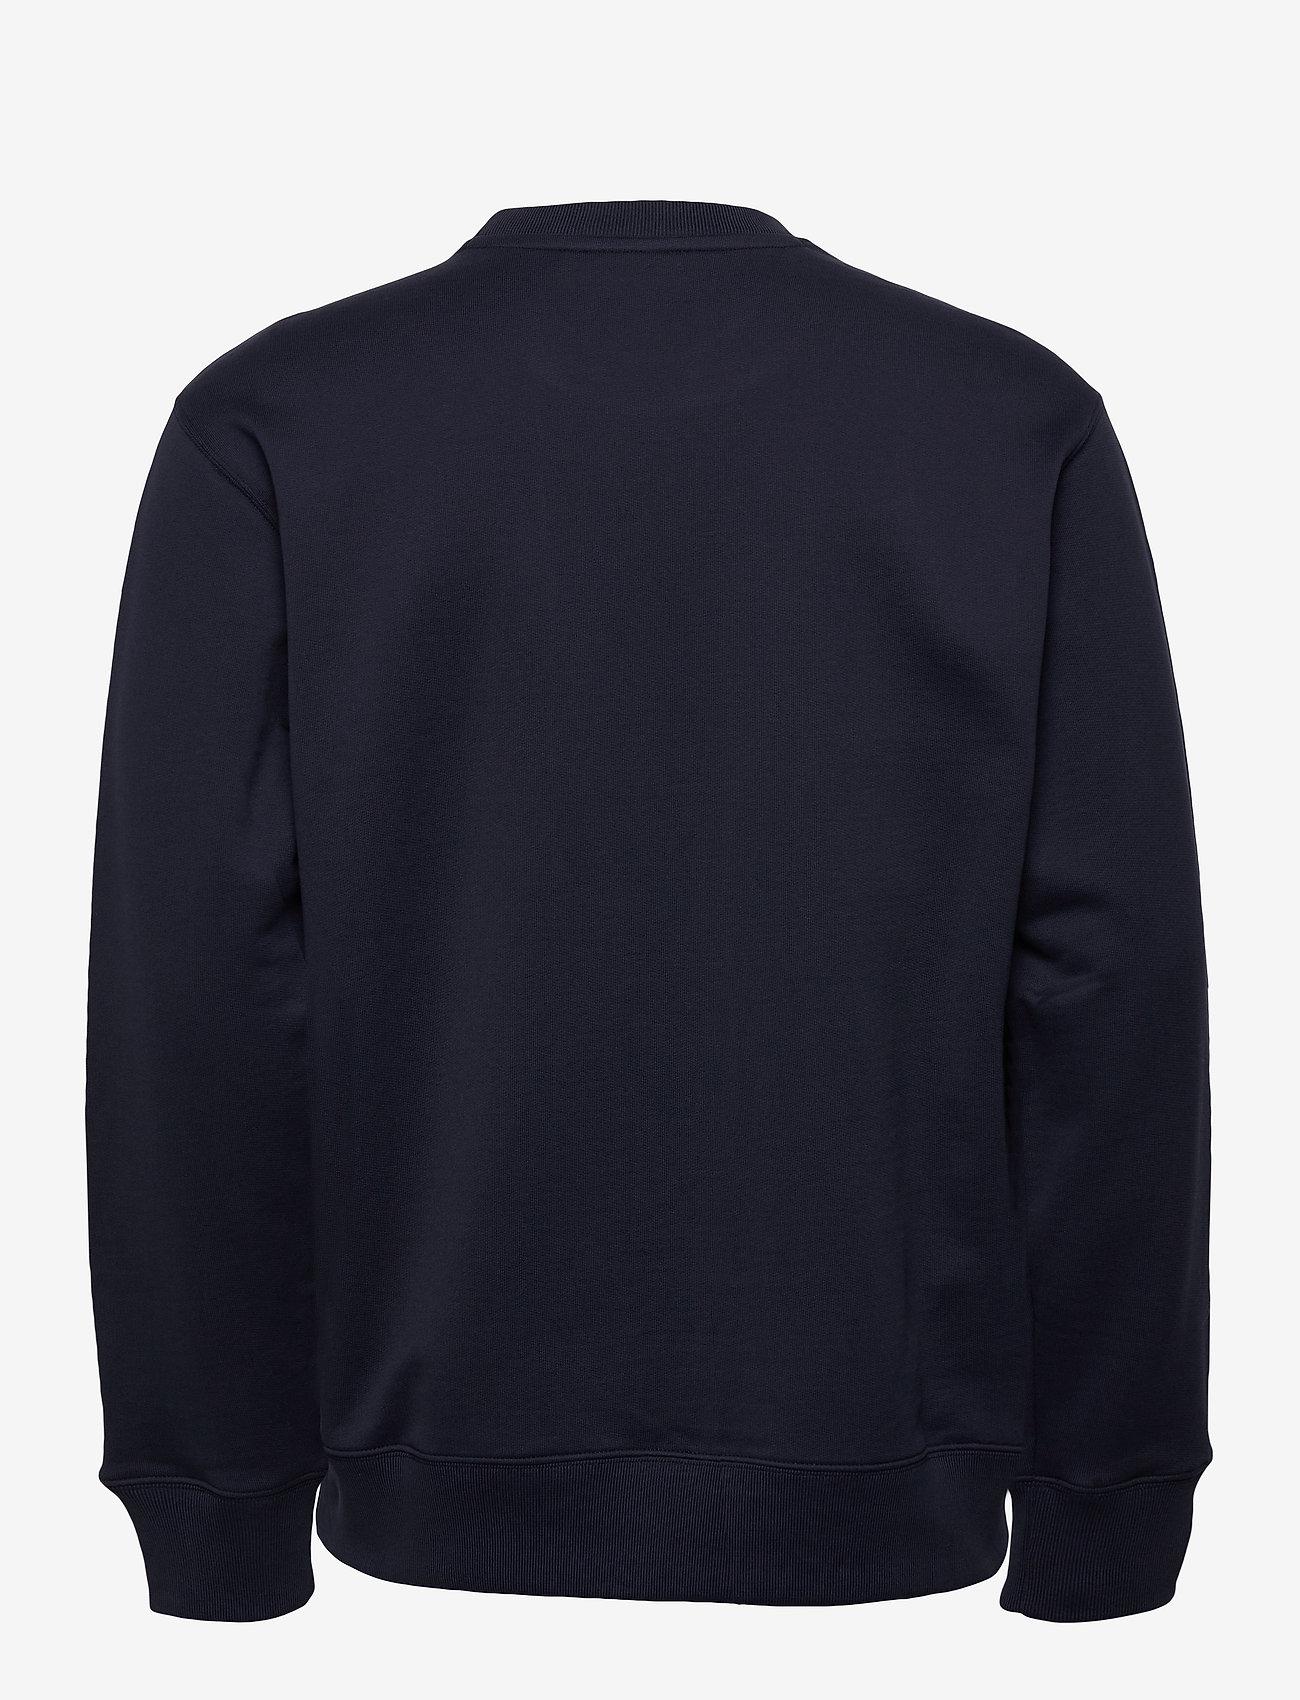 J. Lindeberg - Hurl Bridge-JLJL Sweat - basic sweatshirts - jl navy - 1